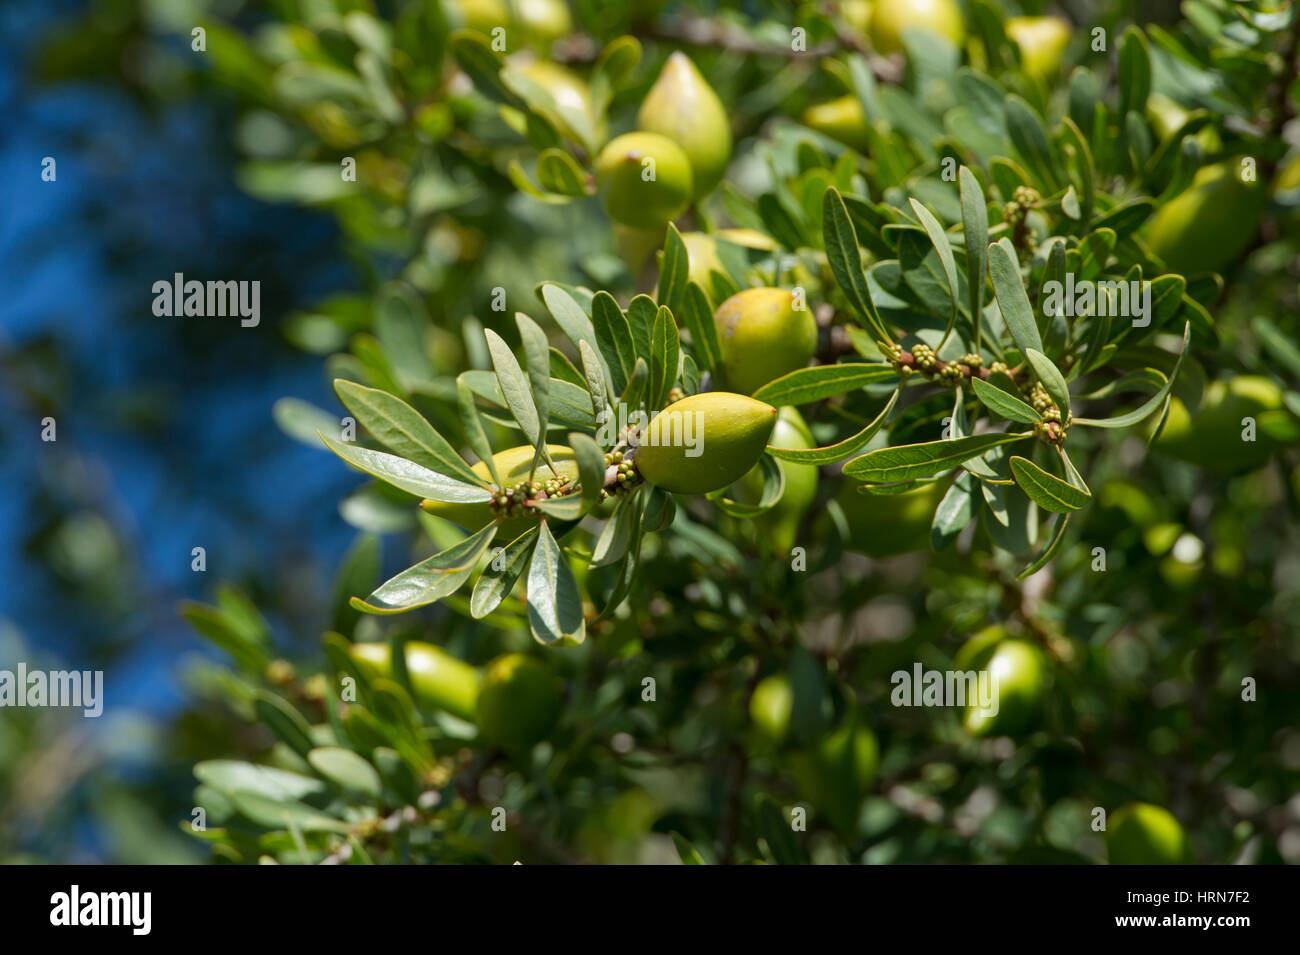 Argan fruit from argan trees (Argania spinosa). Southwest Morocco - Stock Image